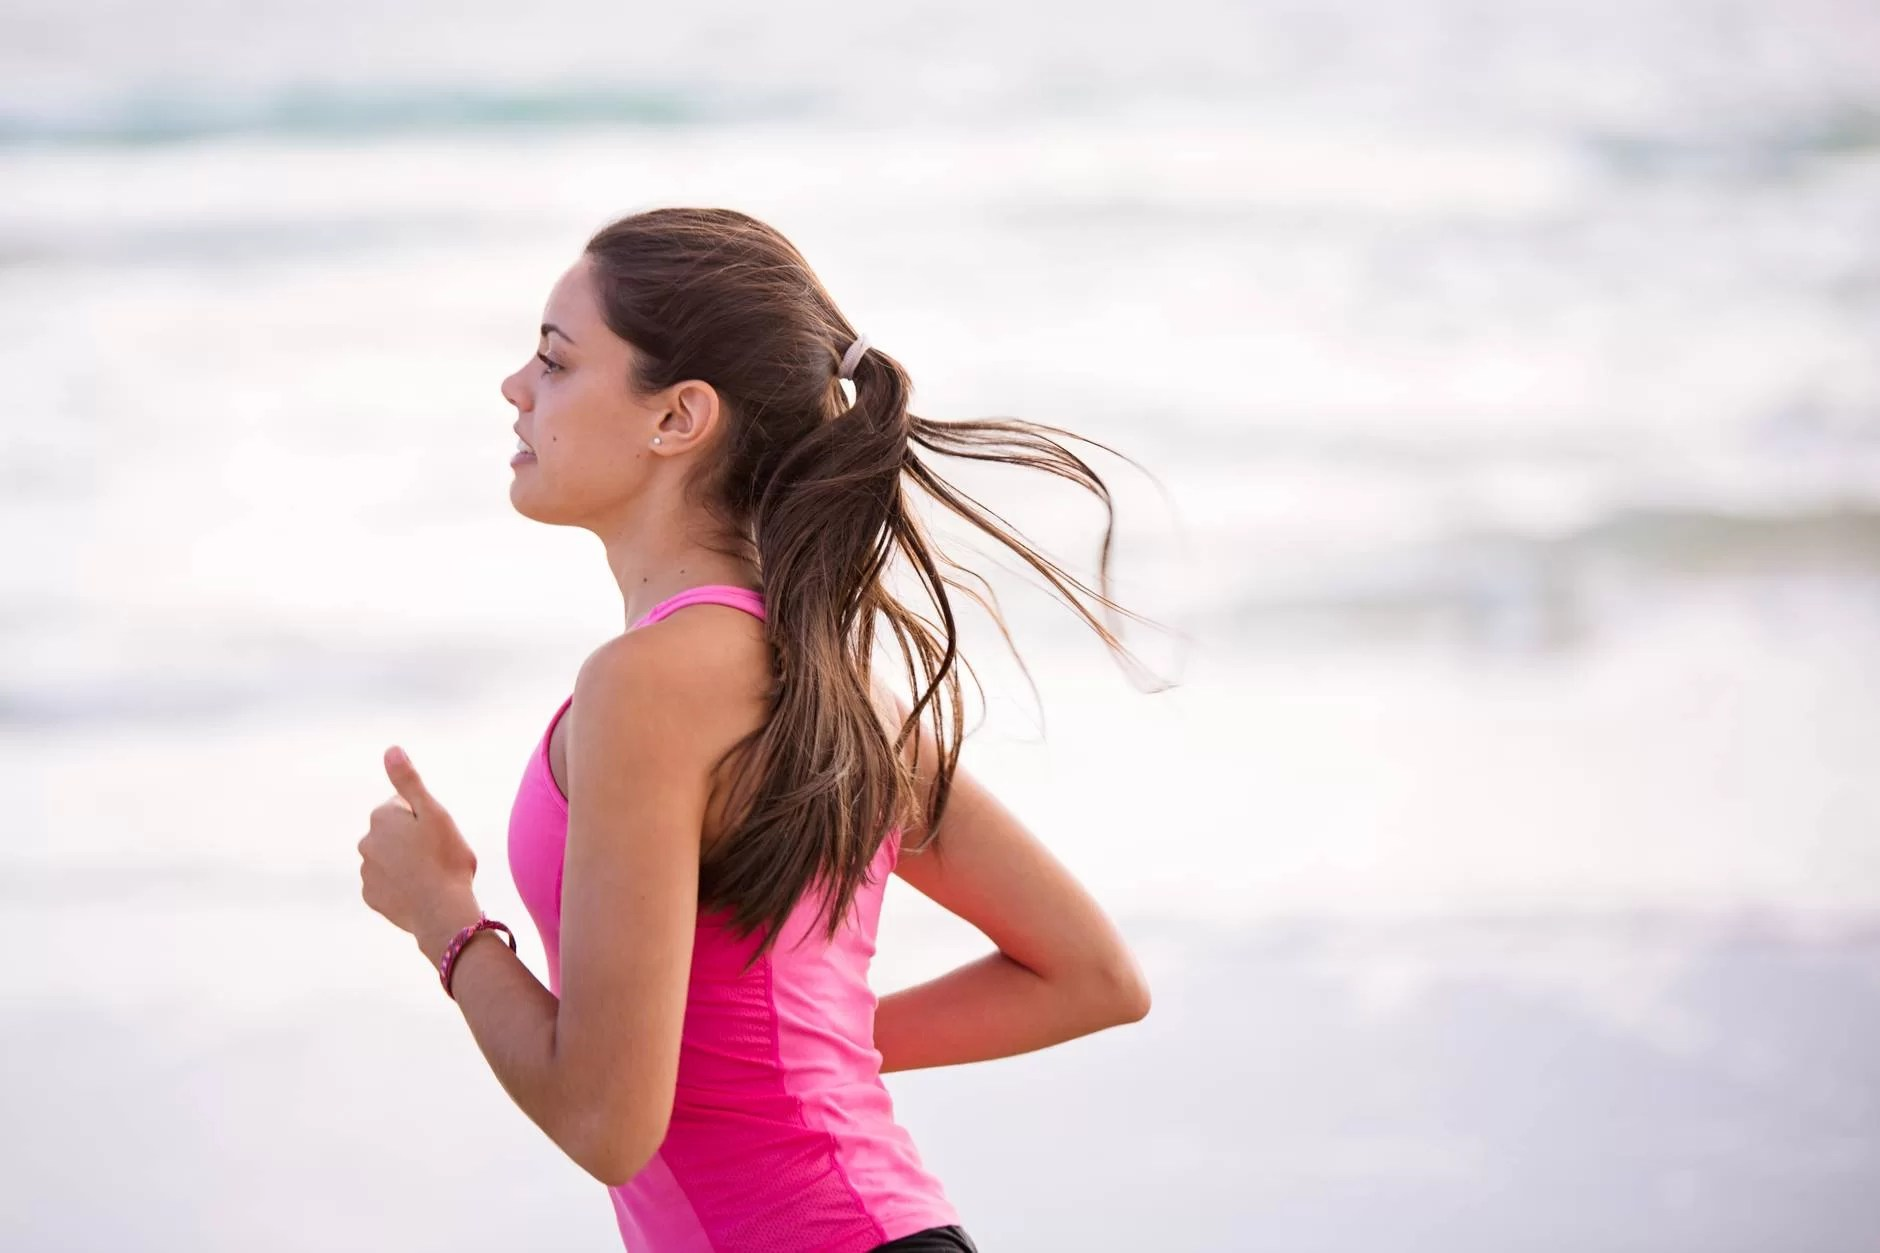 Mujer haciendo runnning en la playa